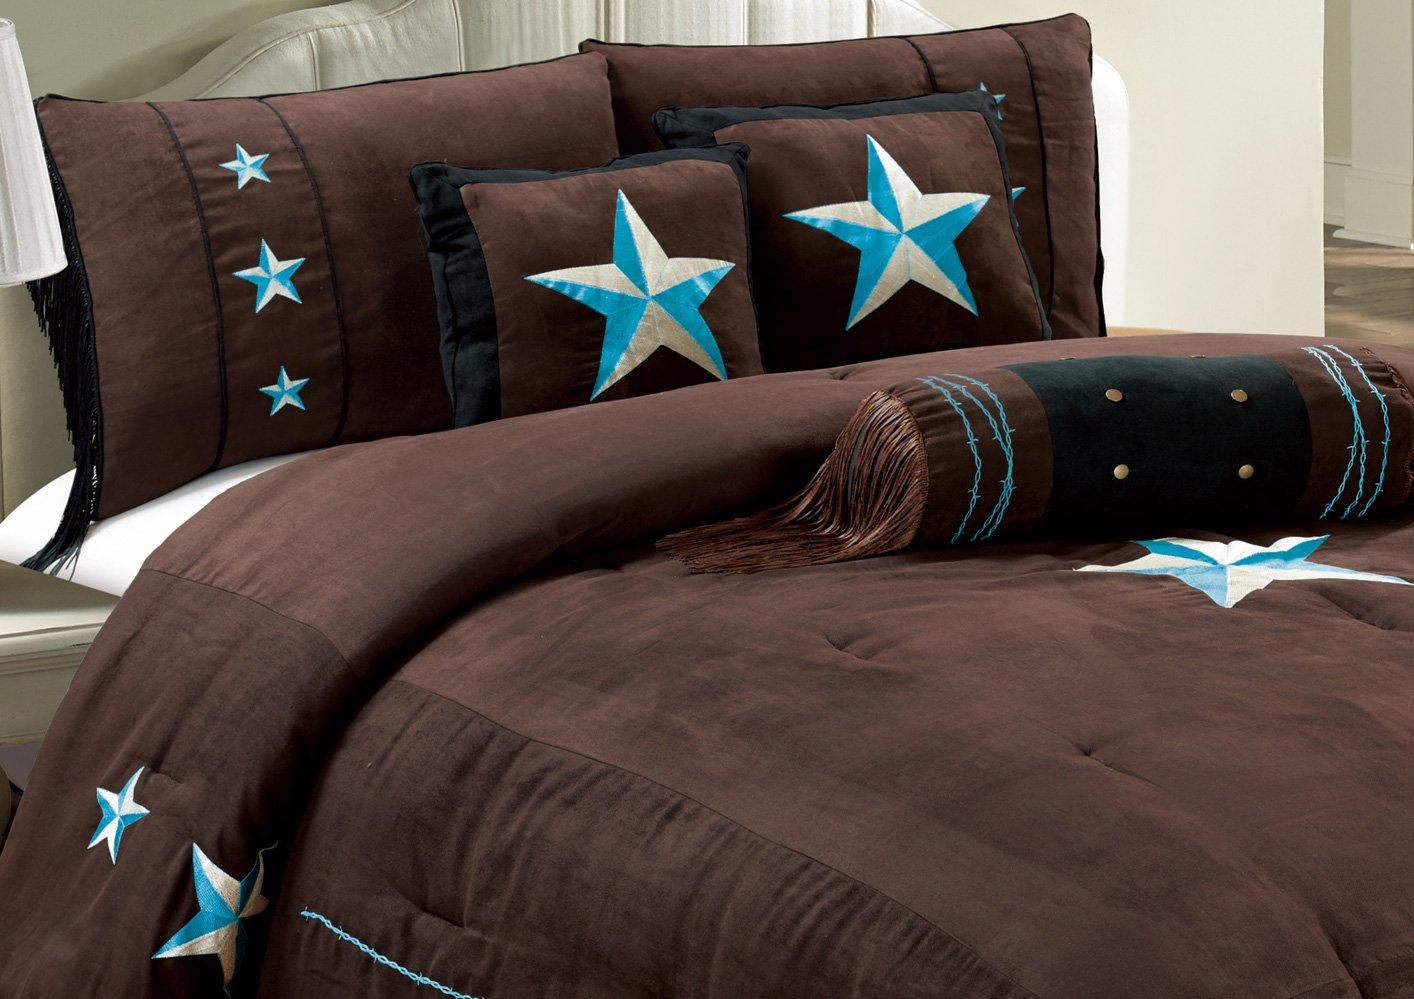 Comforter Set Dark Brown / Turquoise Blue